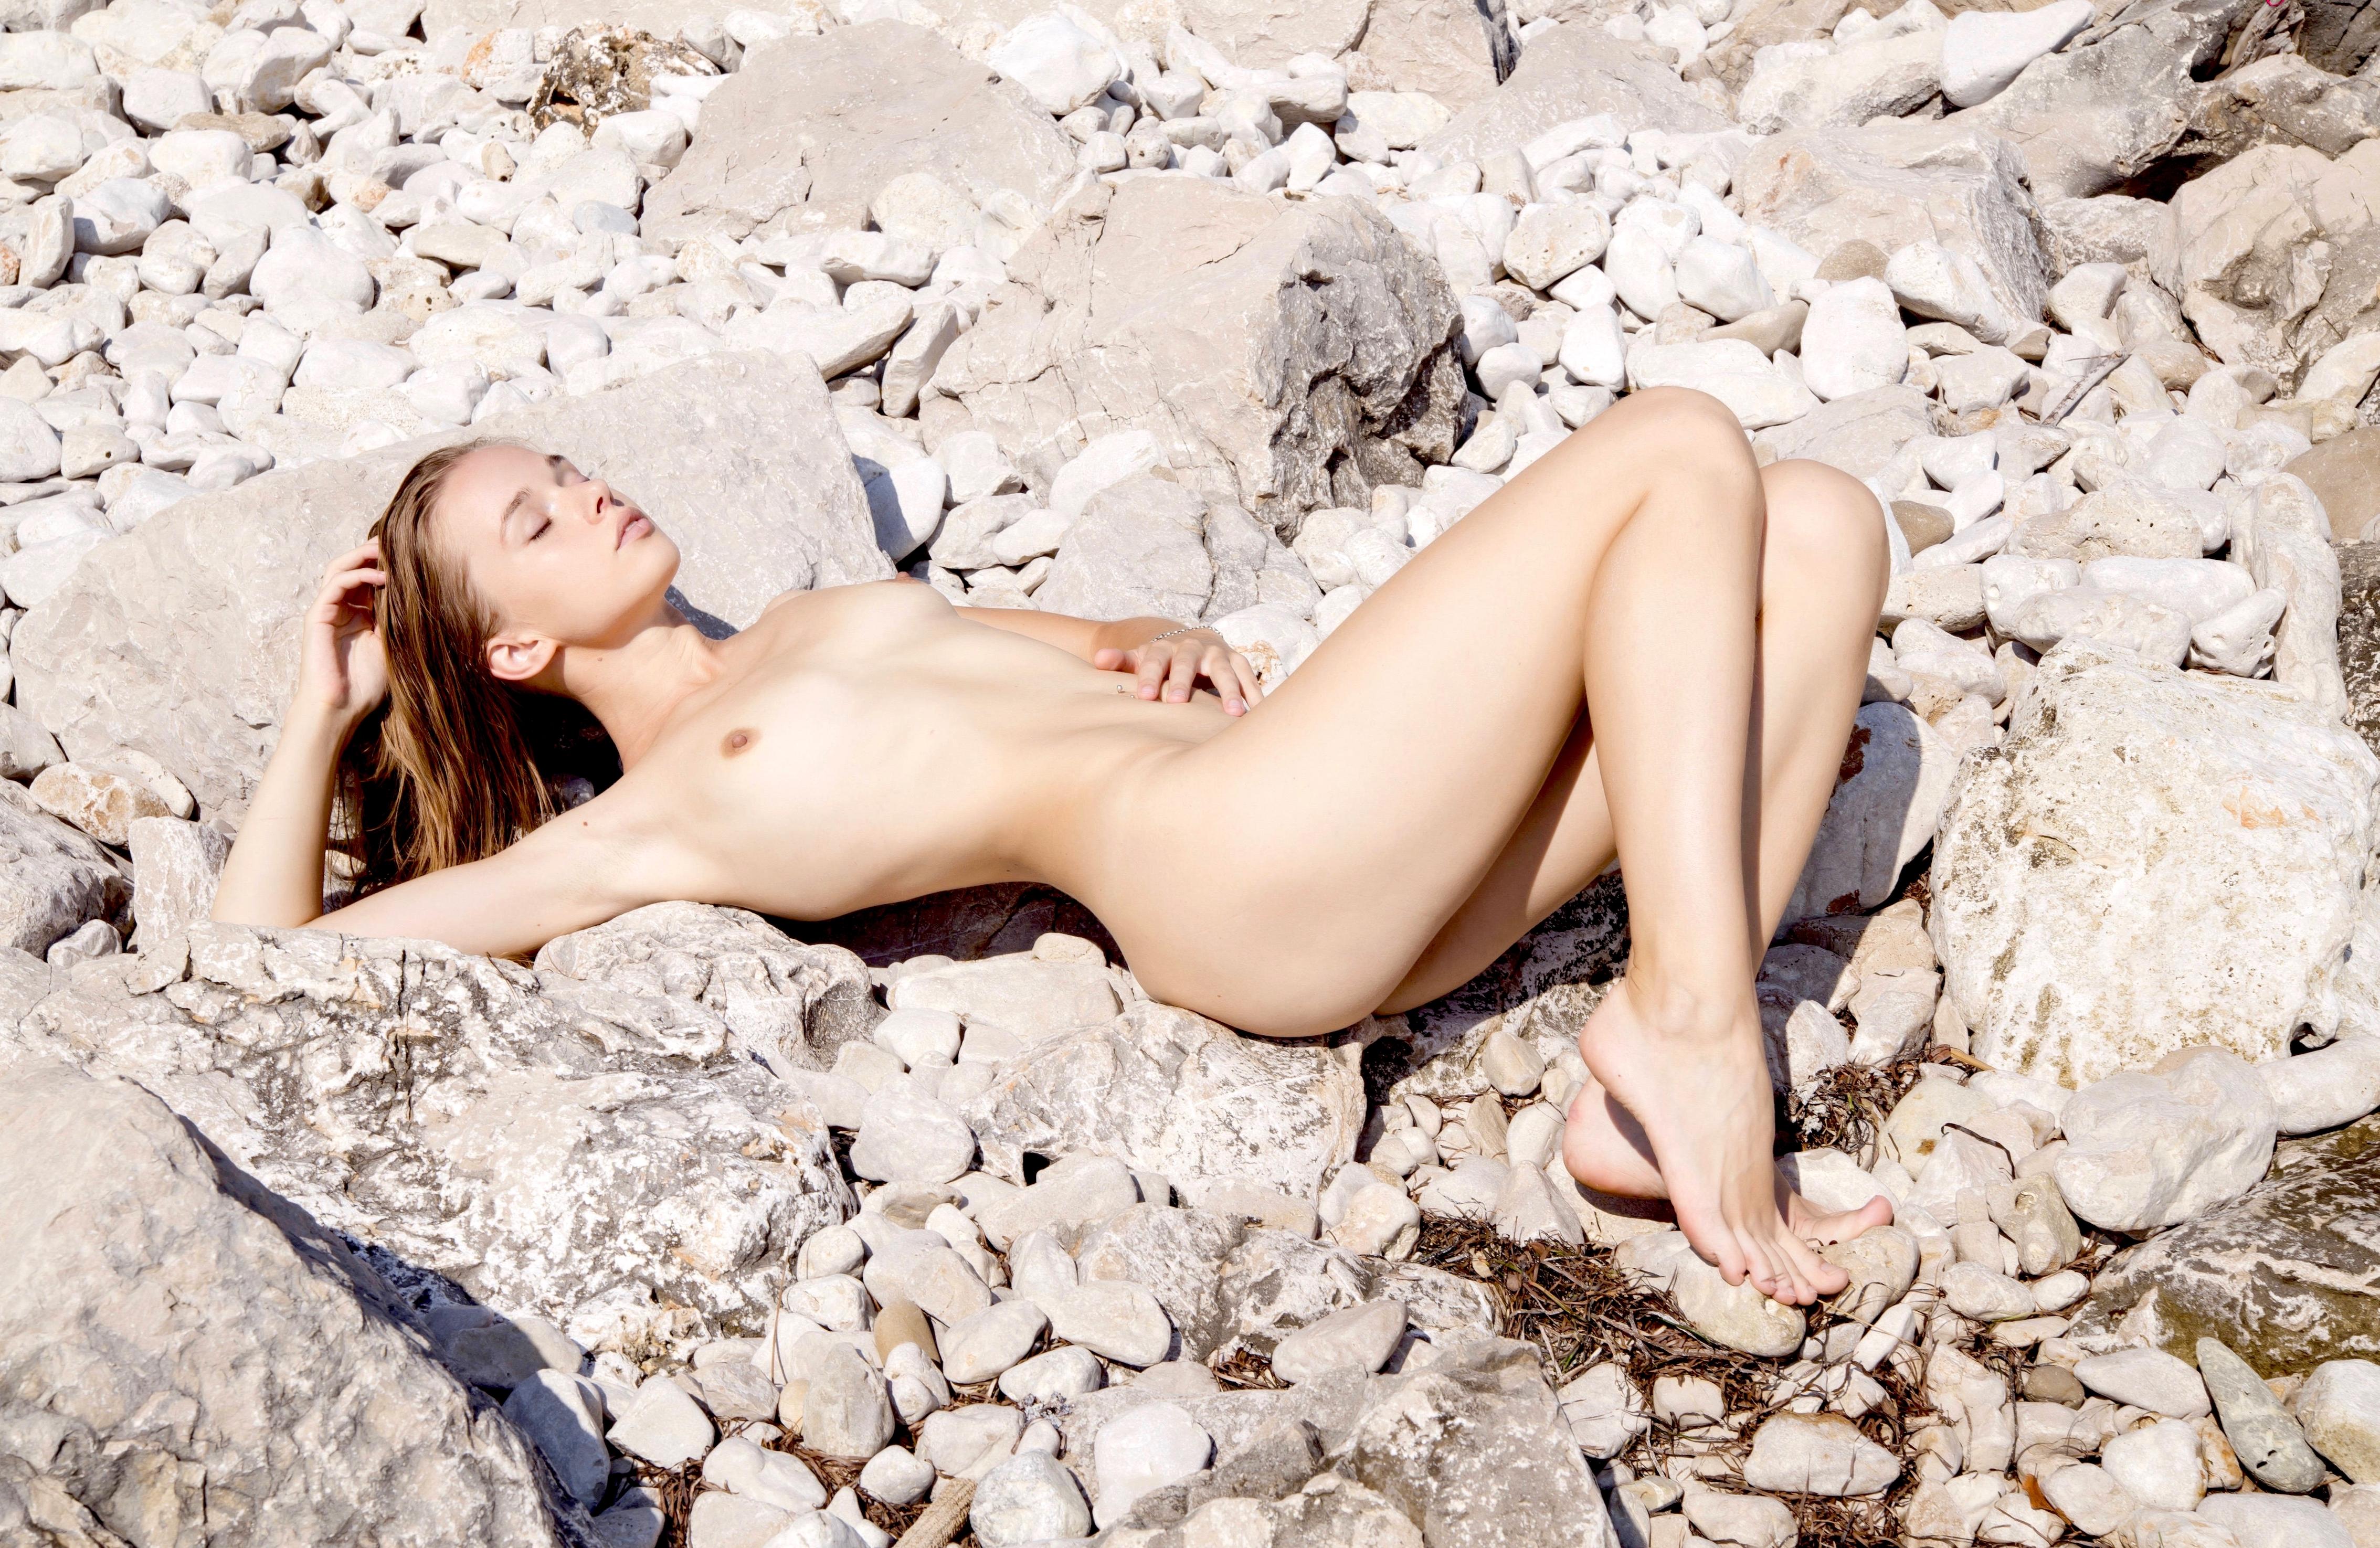 Nude hollywood actress big boobs